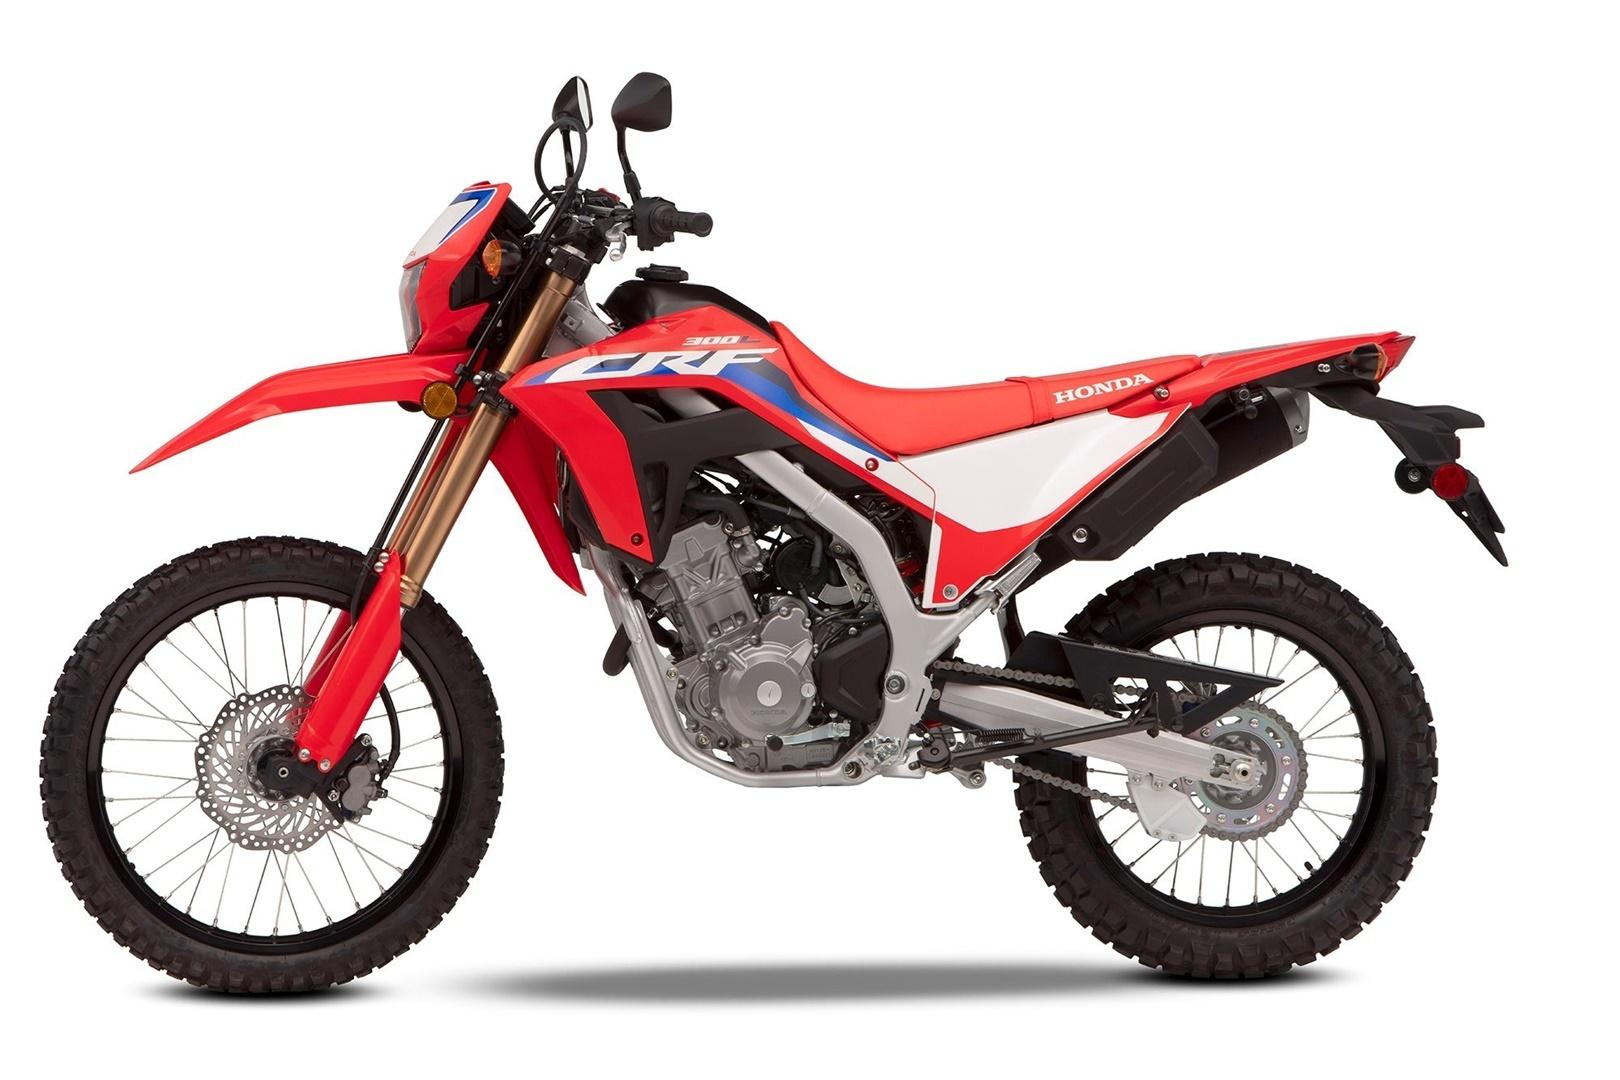 322967 2021 HONDA CRF300L